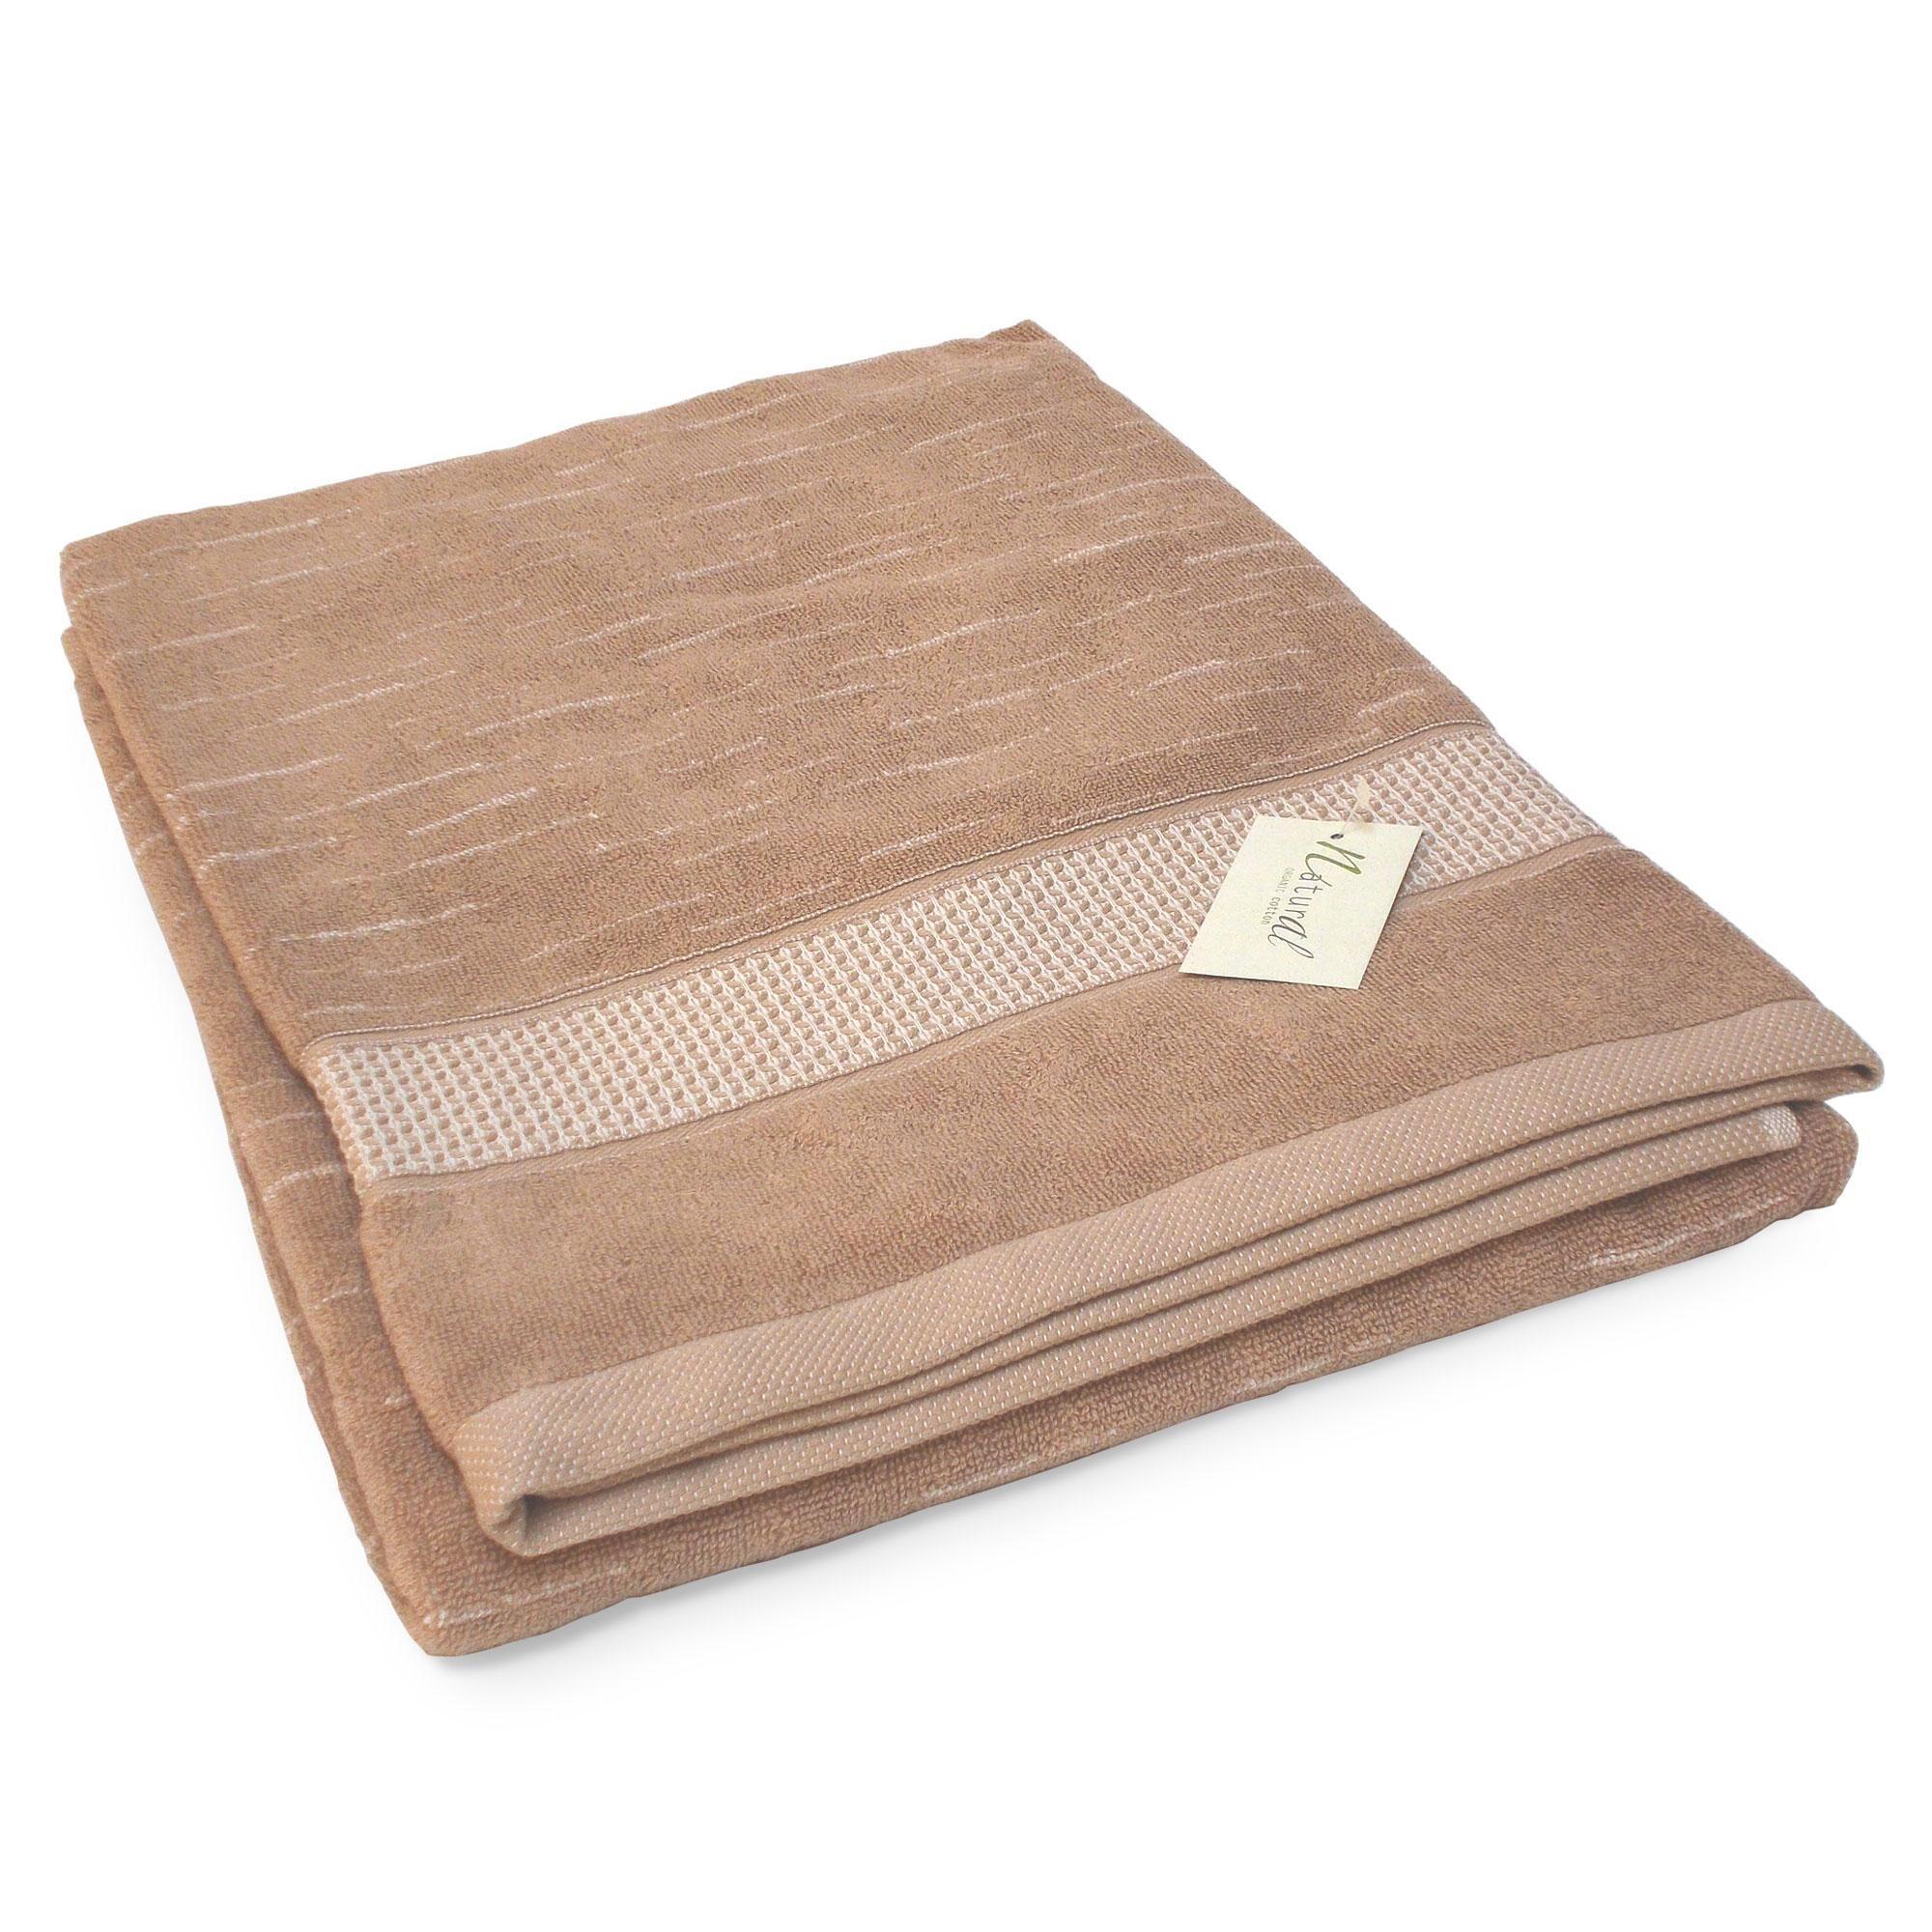 Linnea Drap de bain 90x200 cm FICUS Marron 500 g/m2 pur coton bio